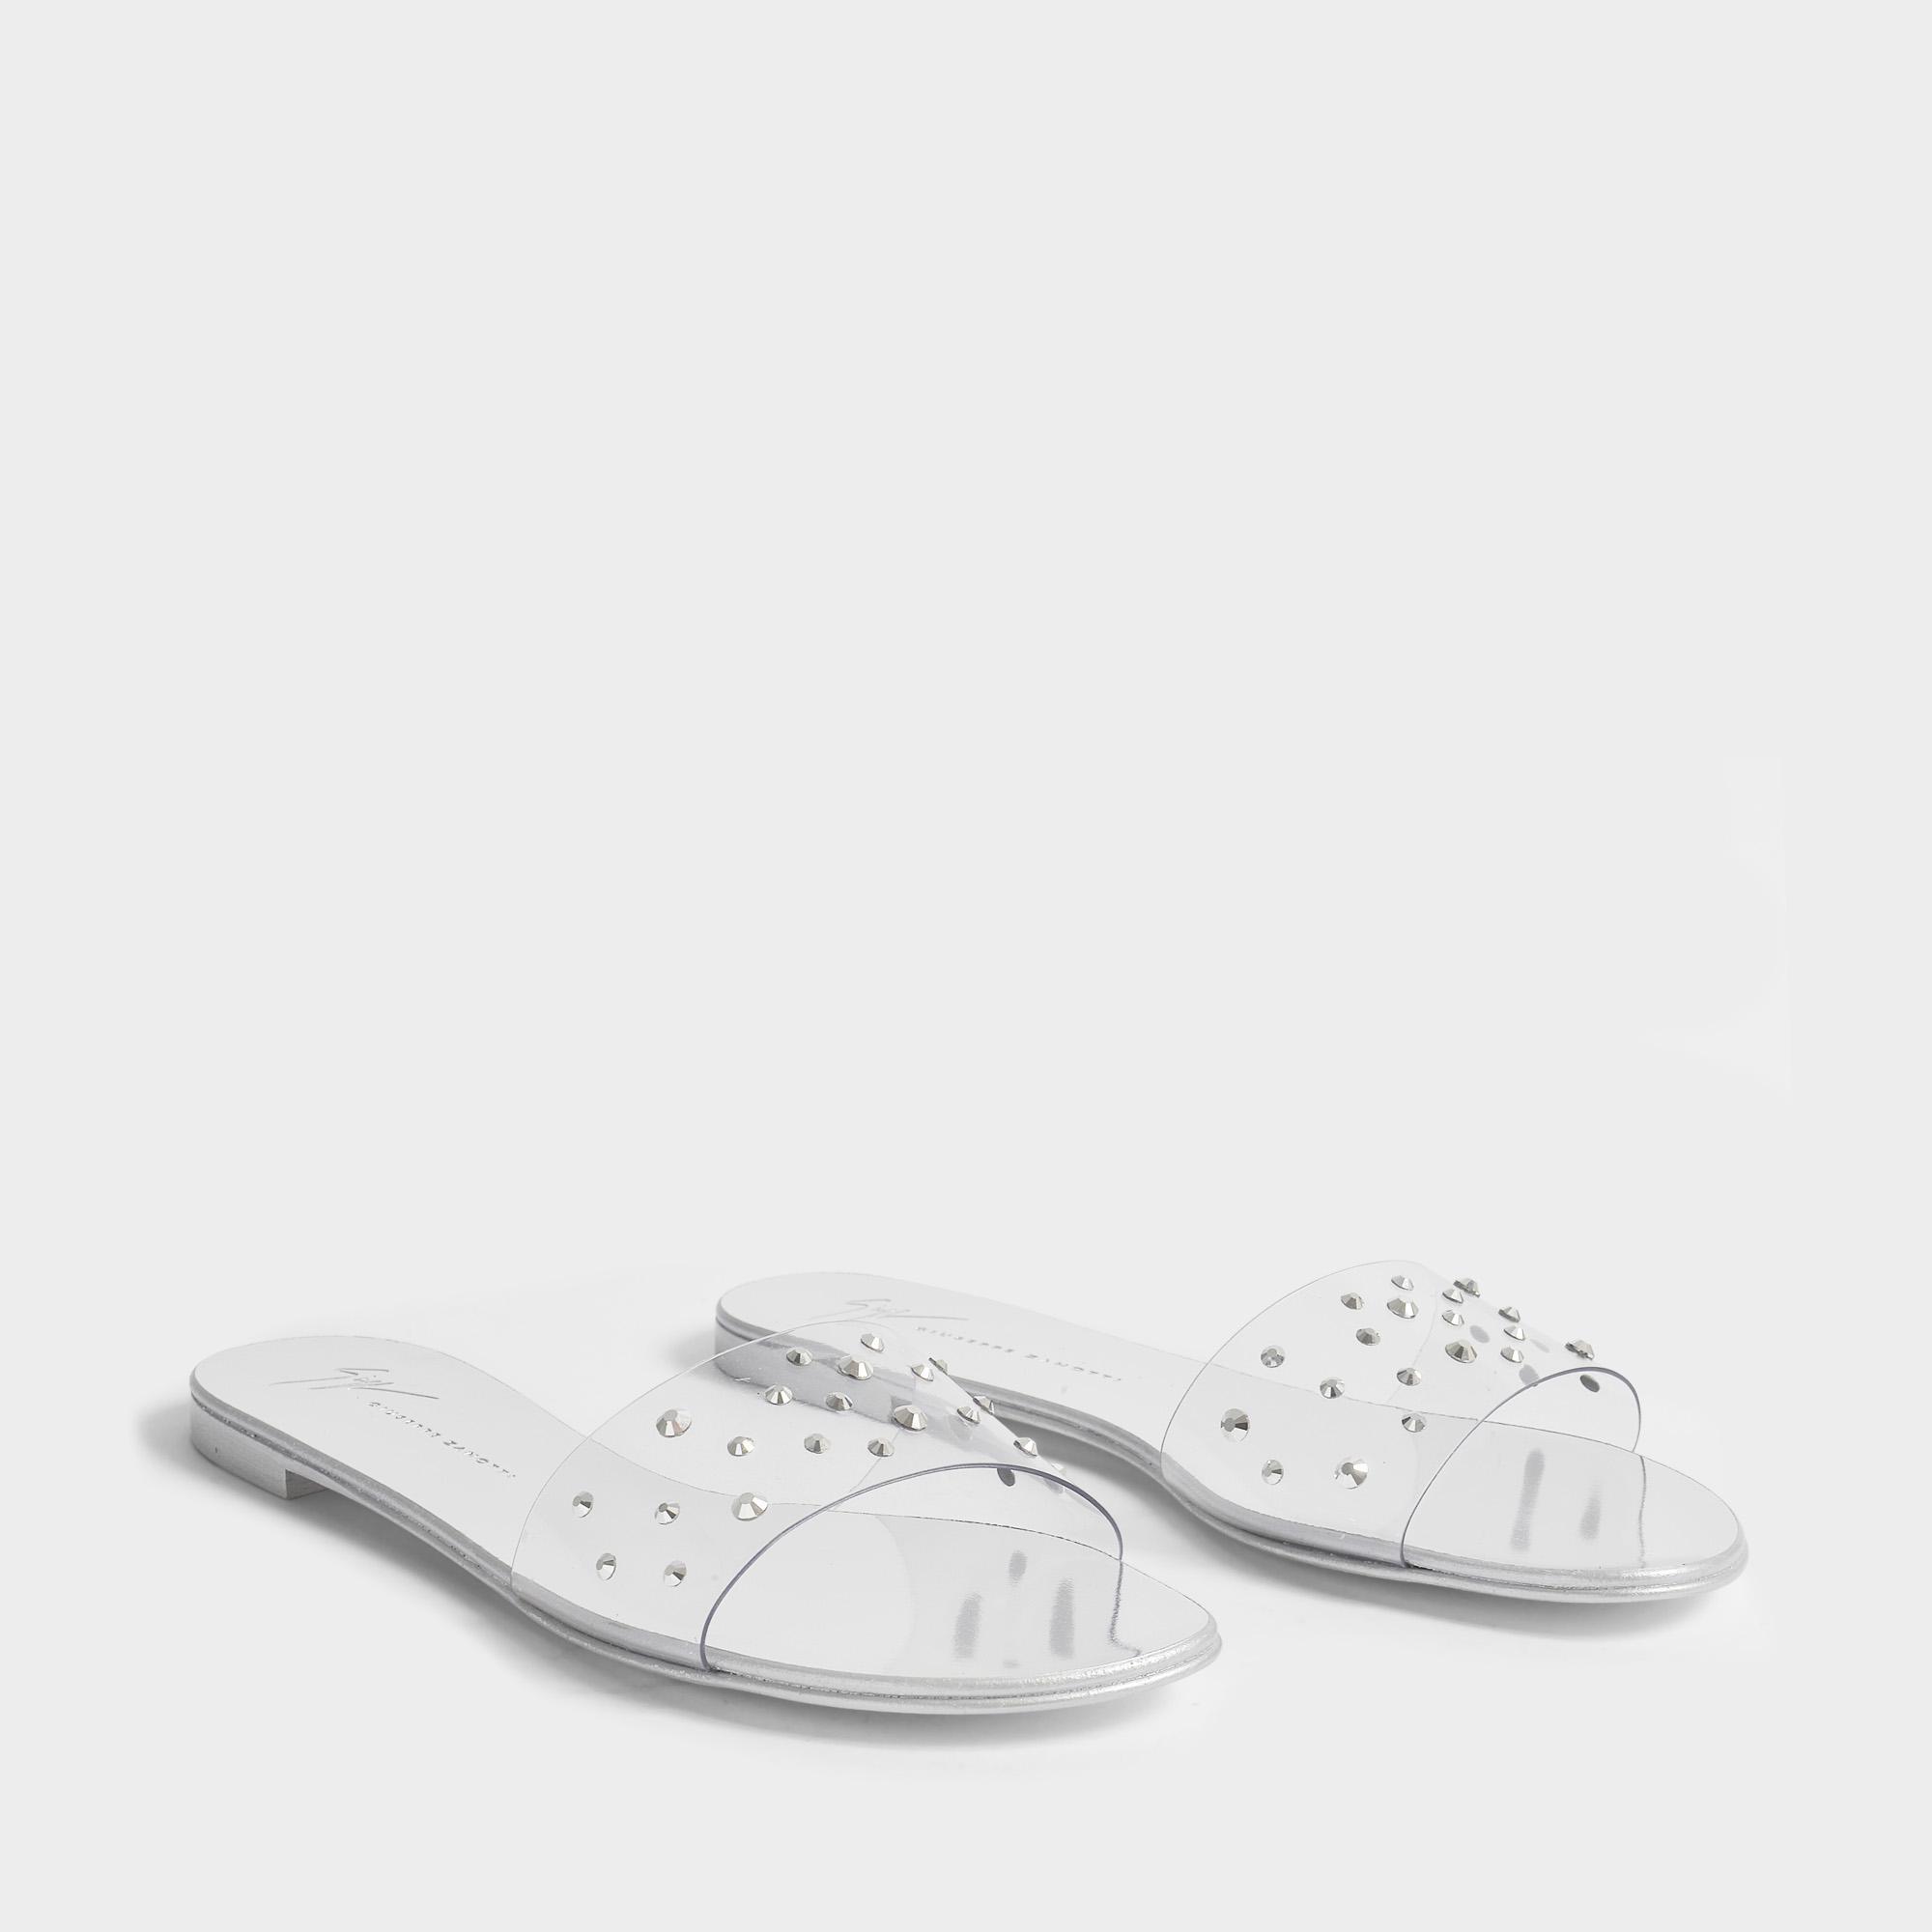 Plexiglass Et Giuseppe Zanotti Chaussures Toboggan Diamonte En Pvc Argent LT27iz6q